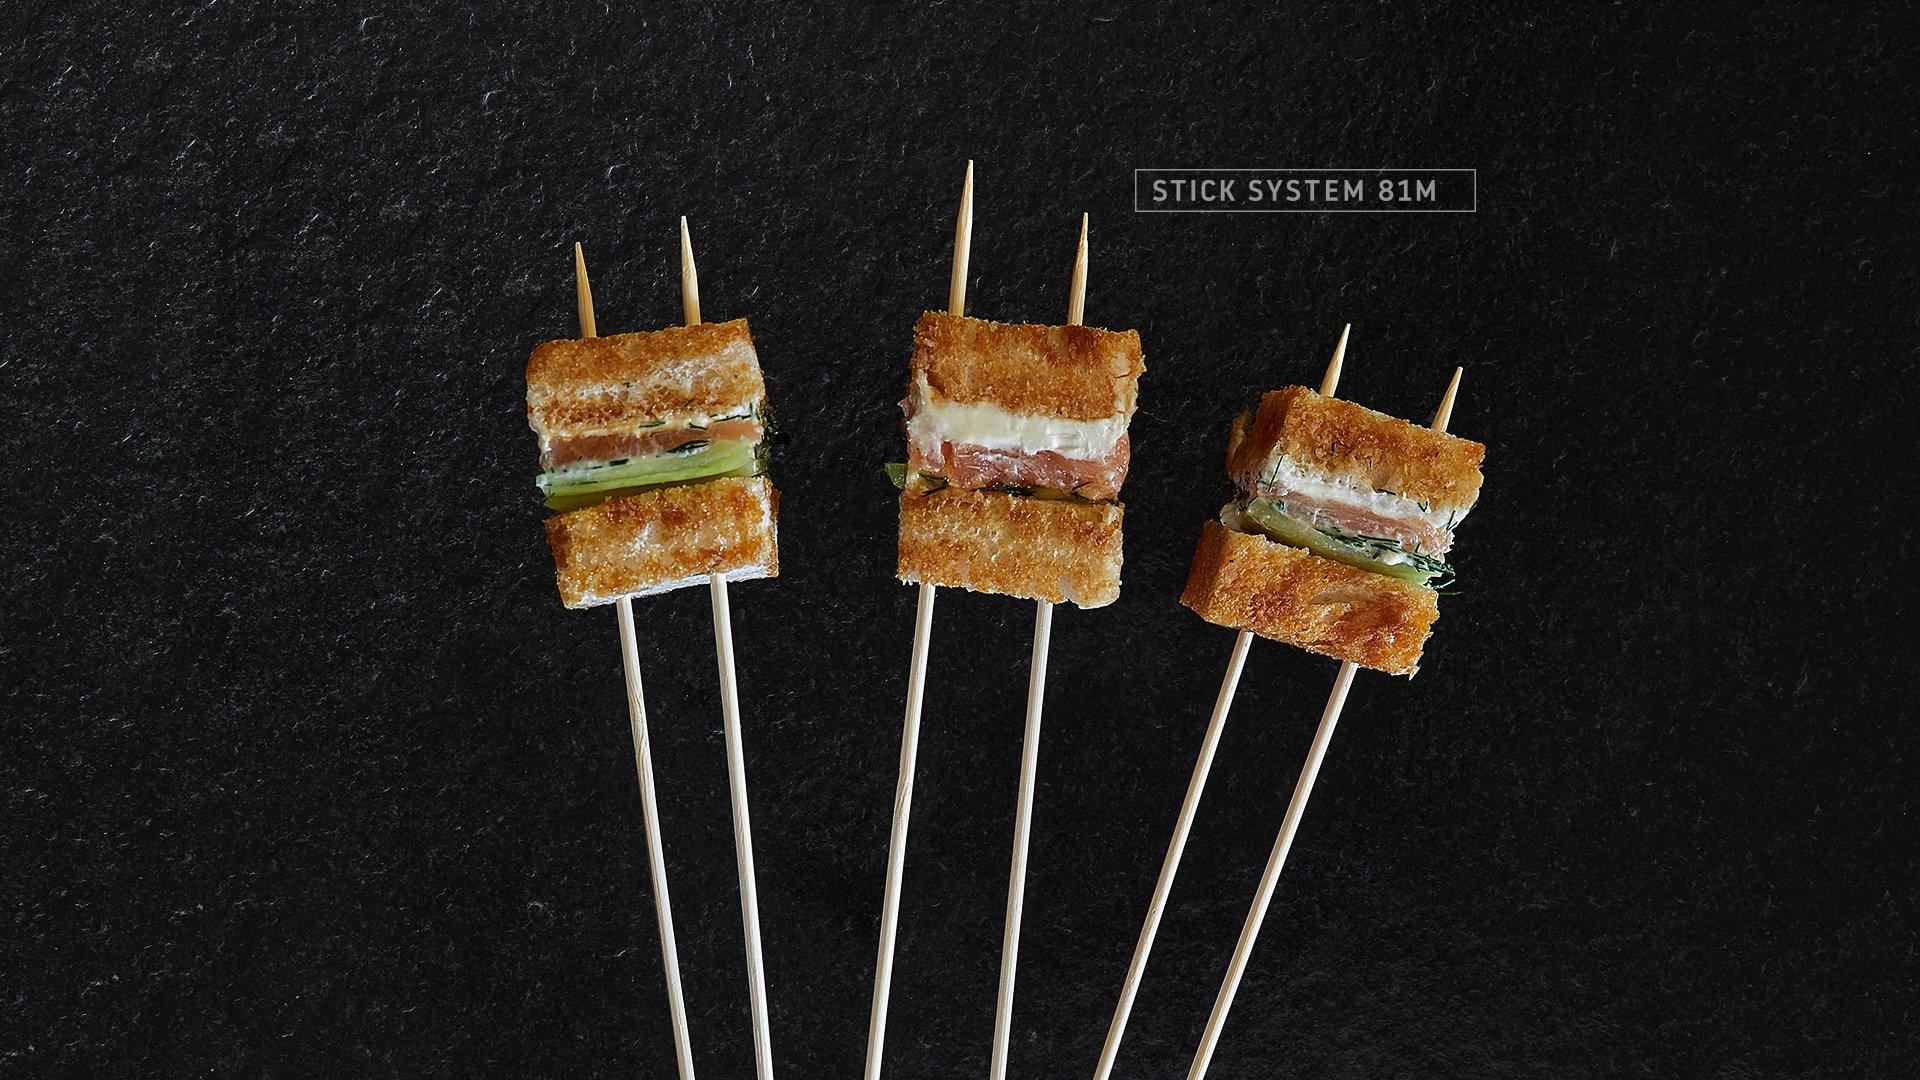 Miveg Skewer Systems · Brotspieß Lach Gurke Merrettich · Bread skewer salmon cucumber horseradish